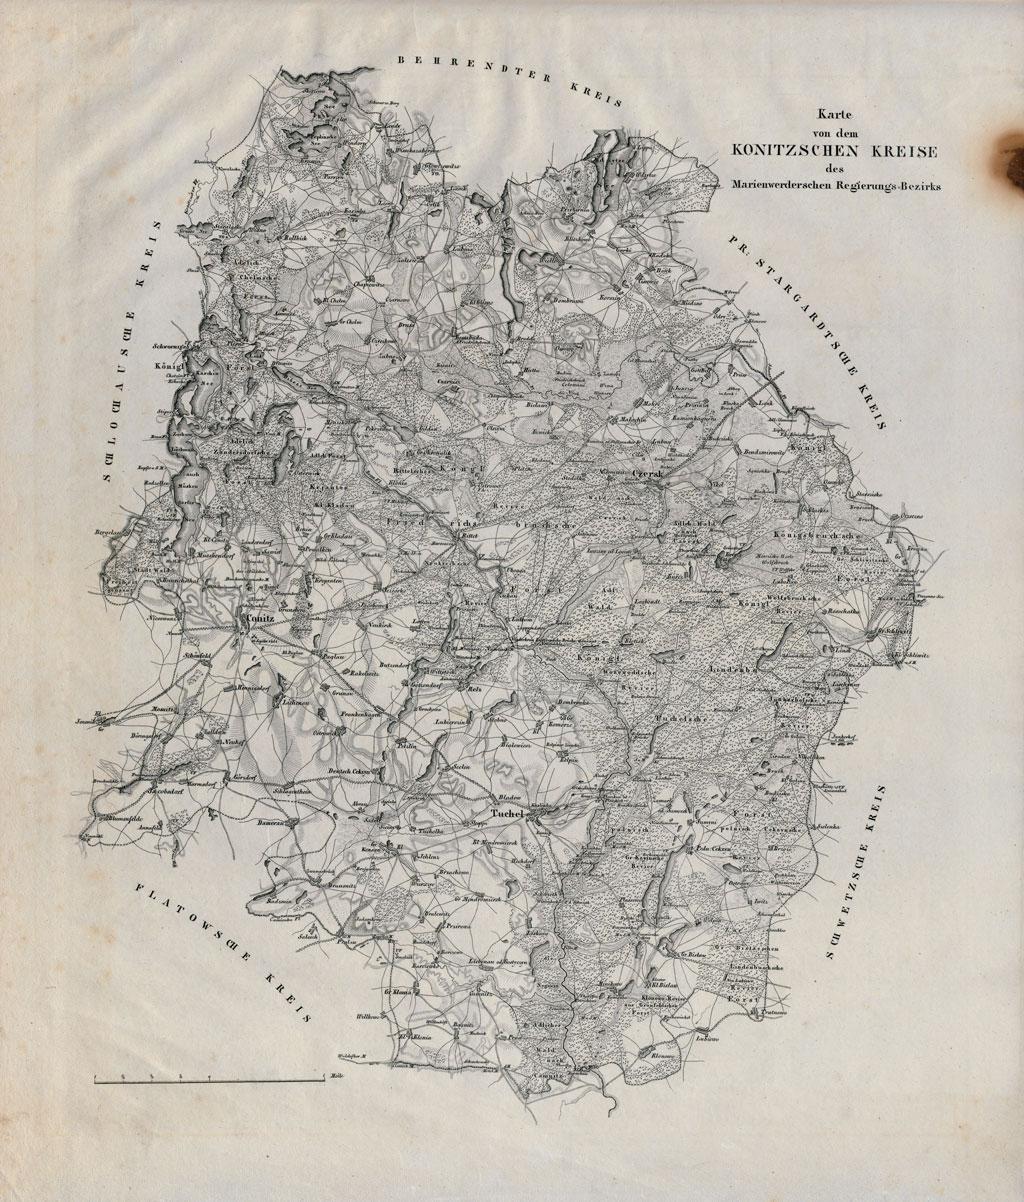 Karte des Konitzschen Kreises (etwa 1825)